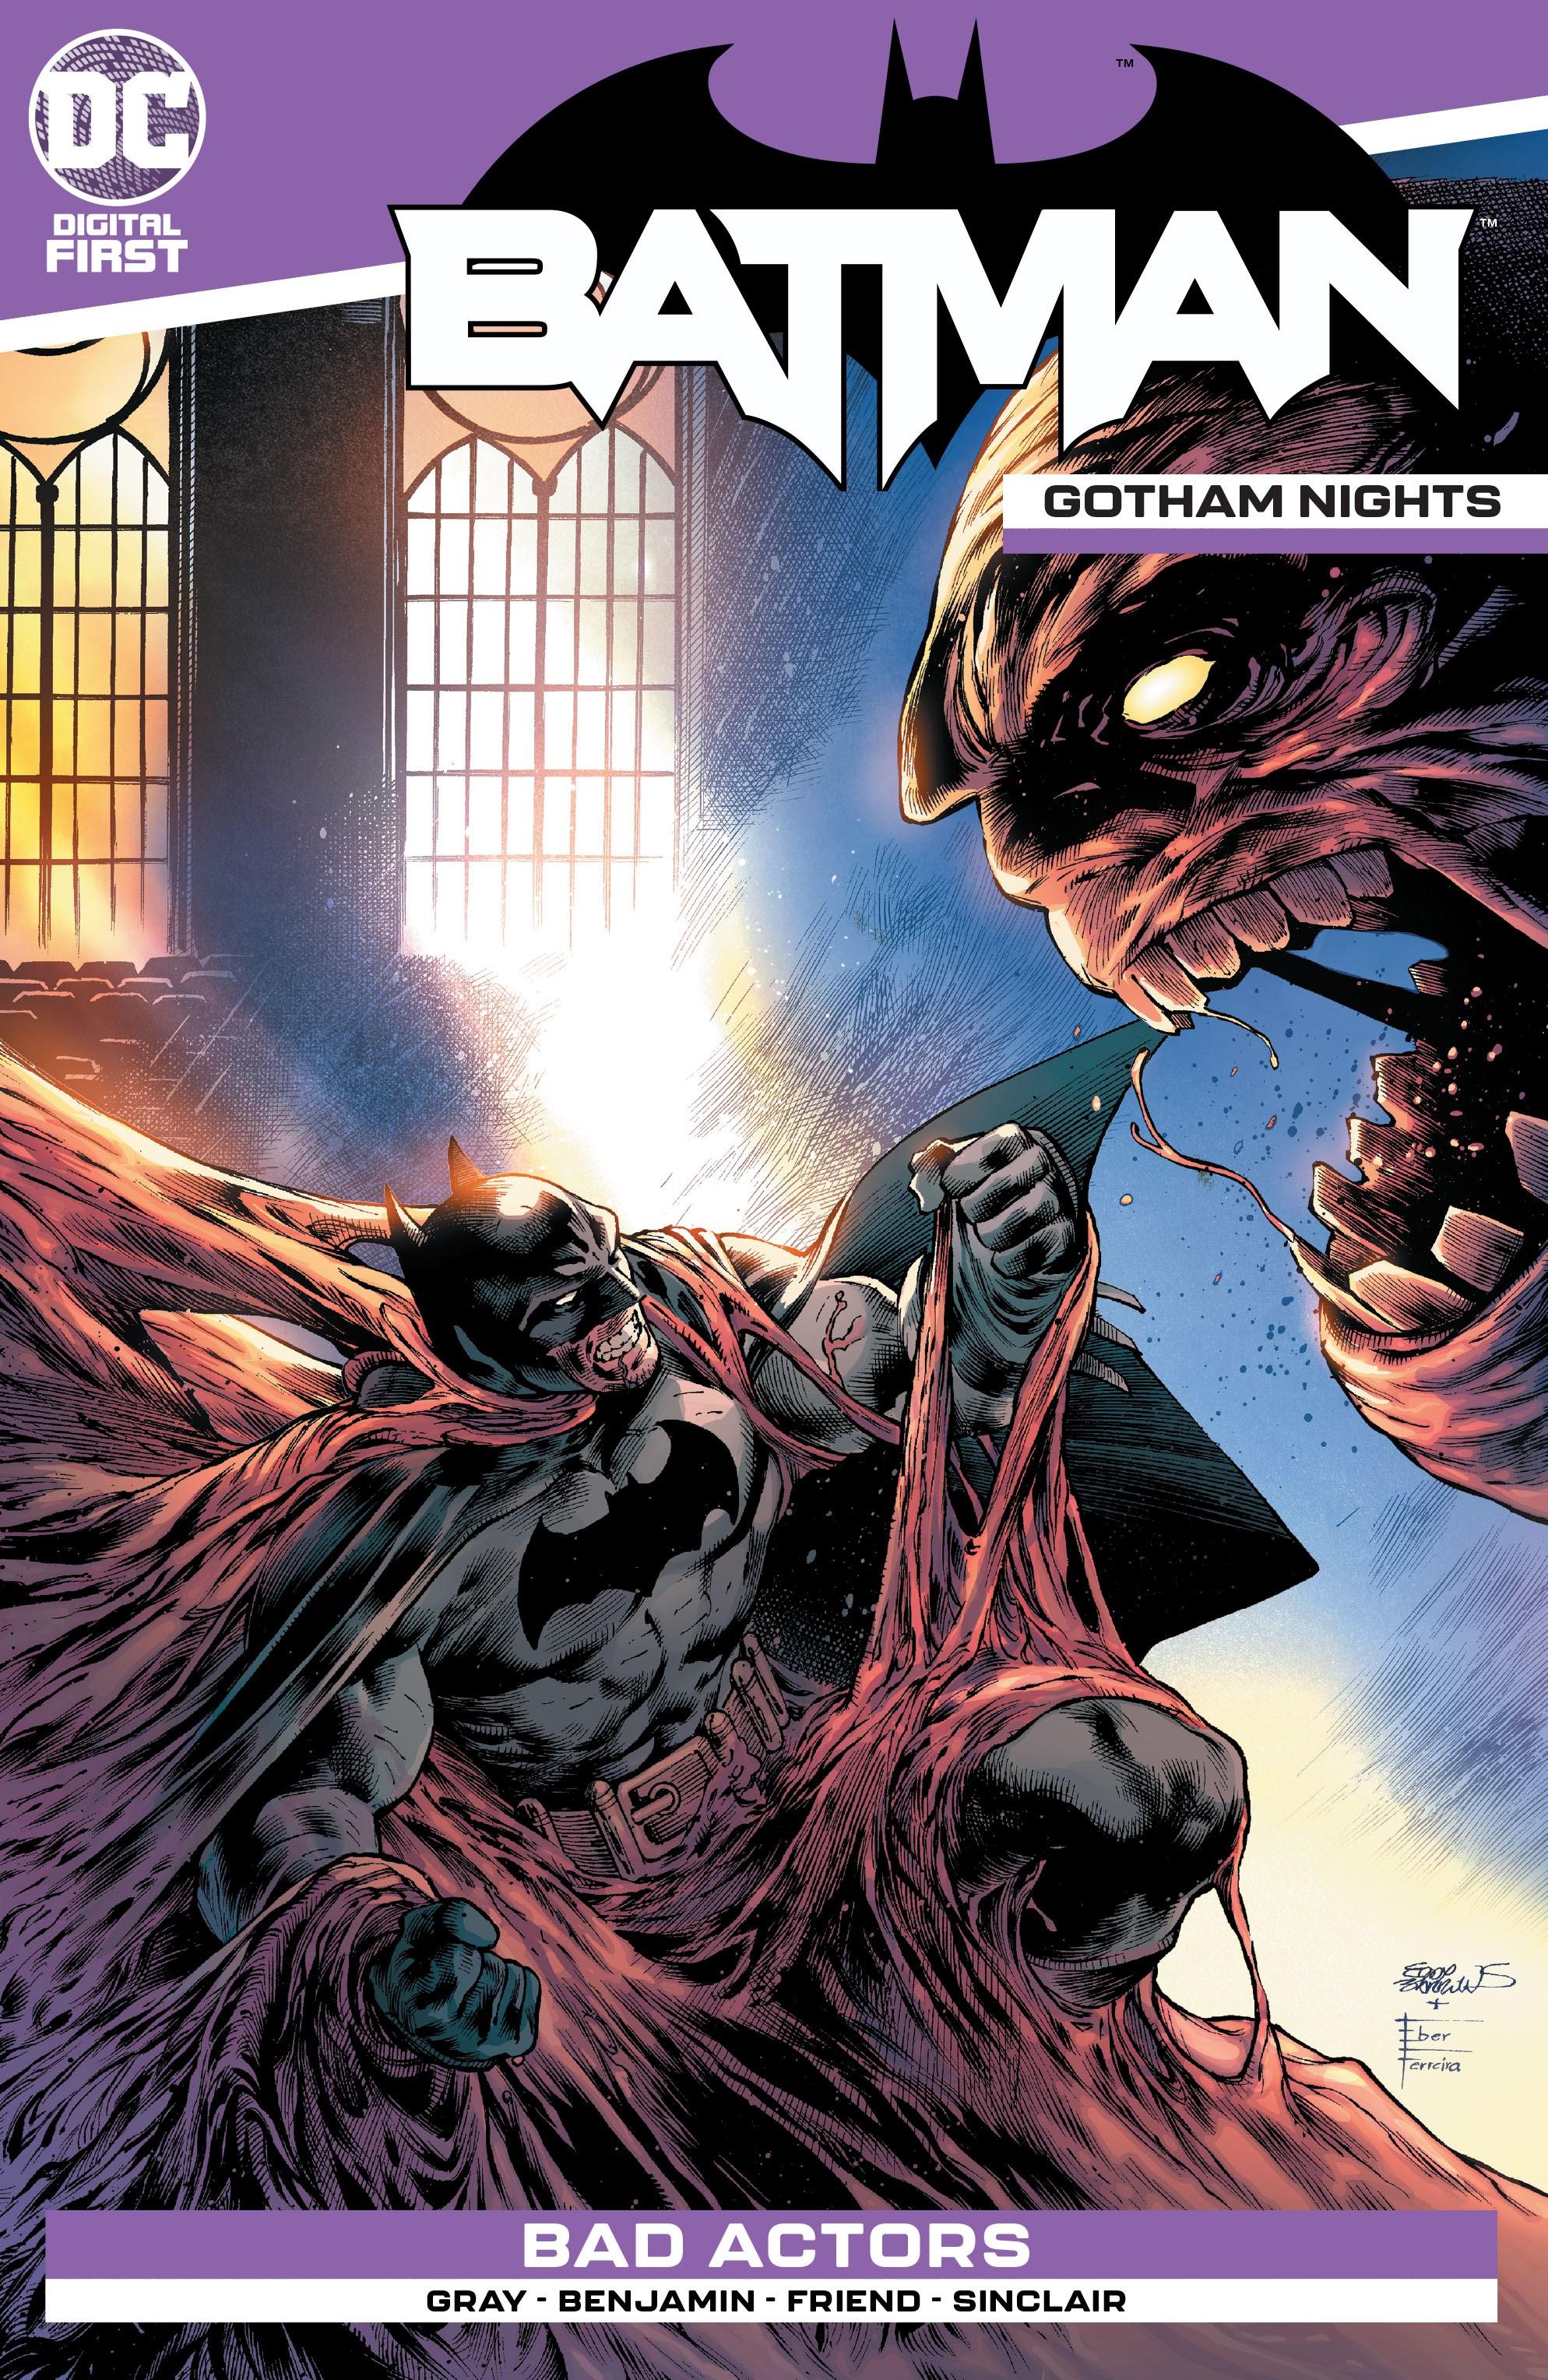 Batman: Gotham Nights Vol 1 2 (Digital)